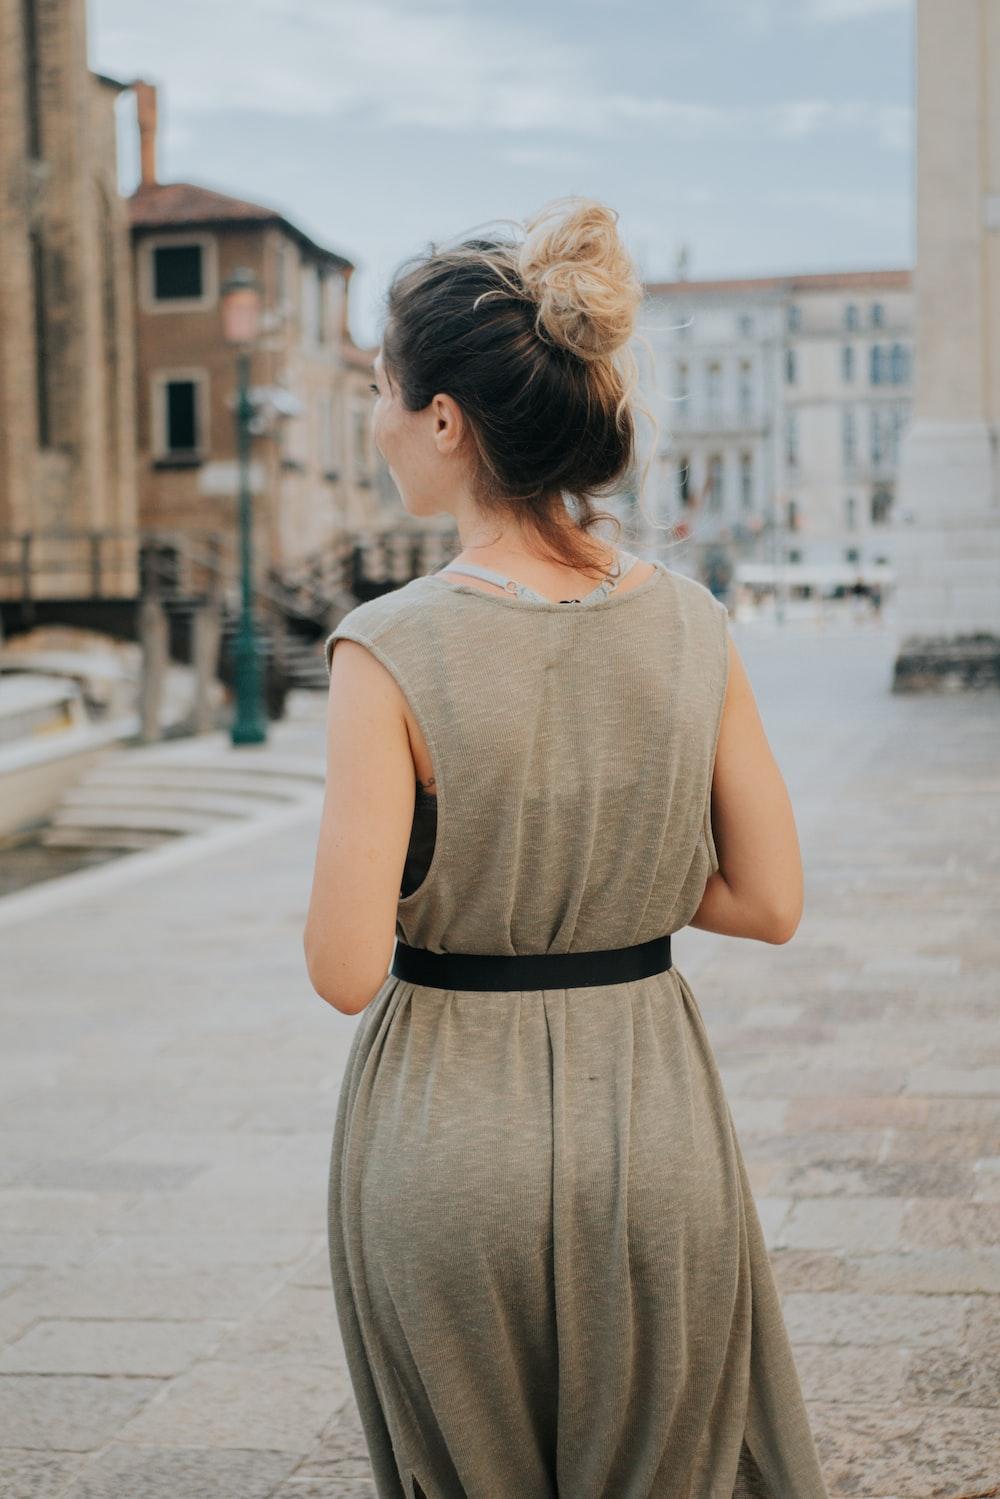 woman in gray sleeveless dress standing on sidewalk during daytime